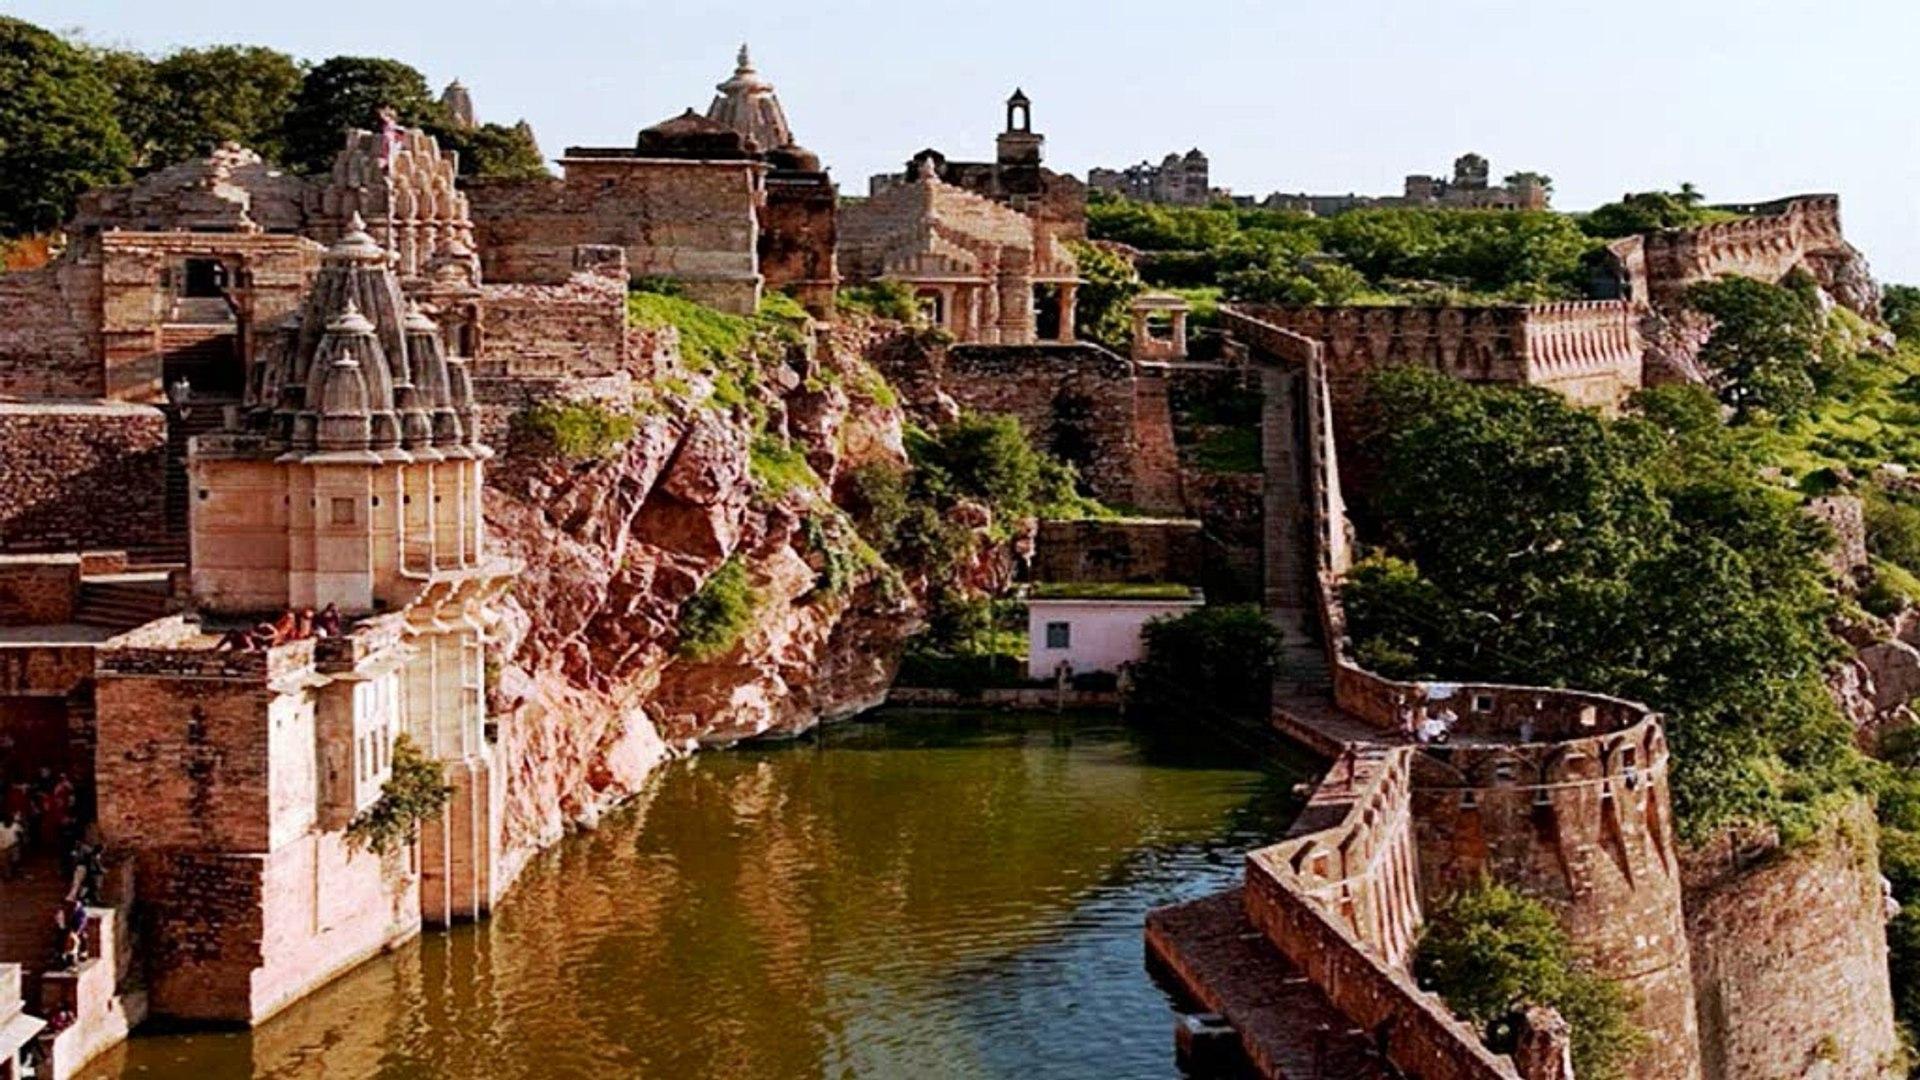 Chittorgarh Fort - Rajasthan, India